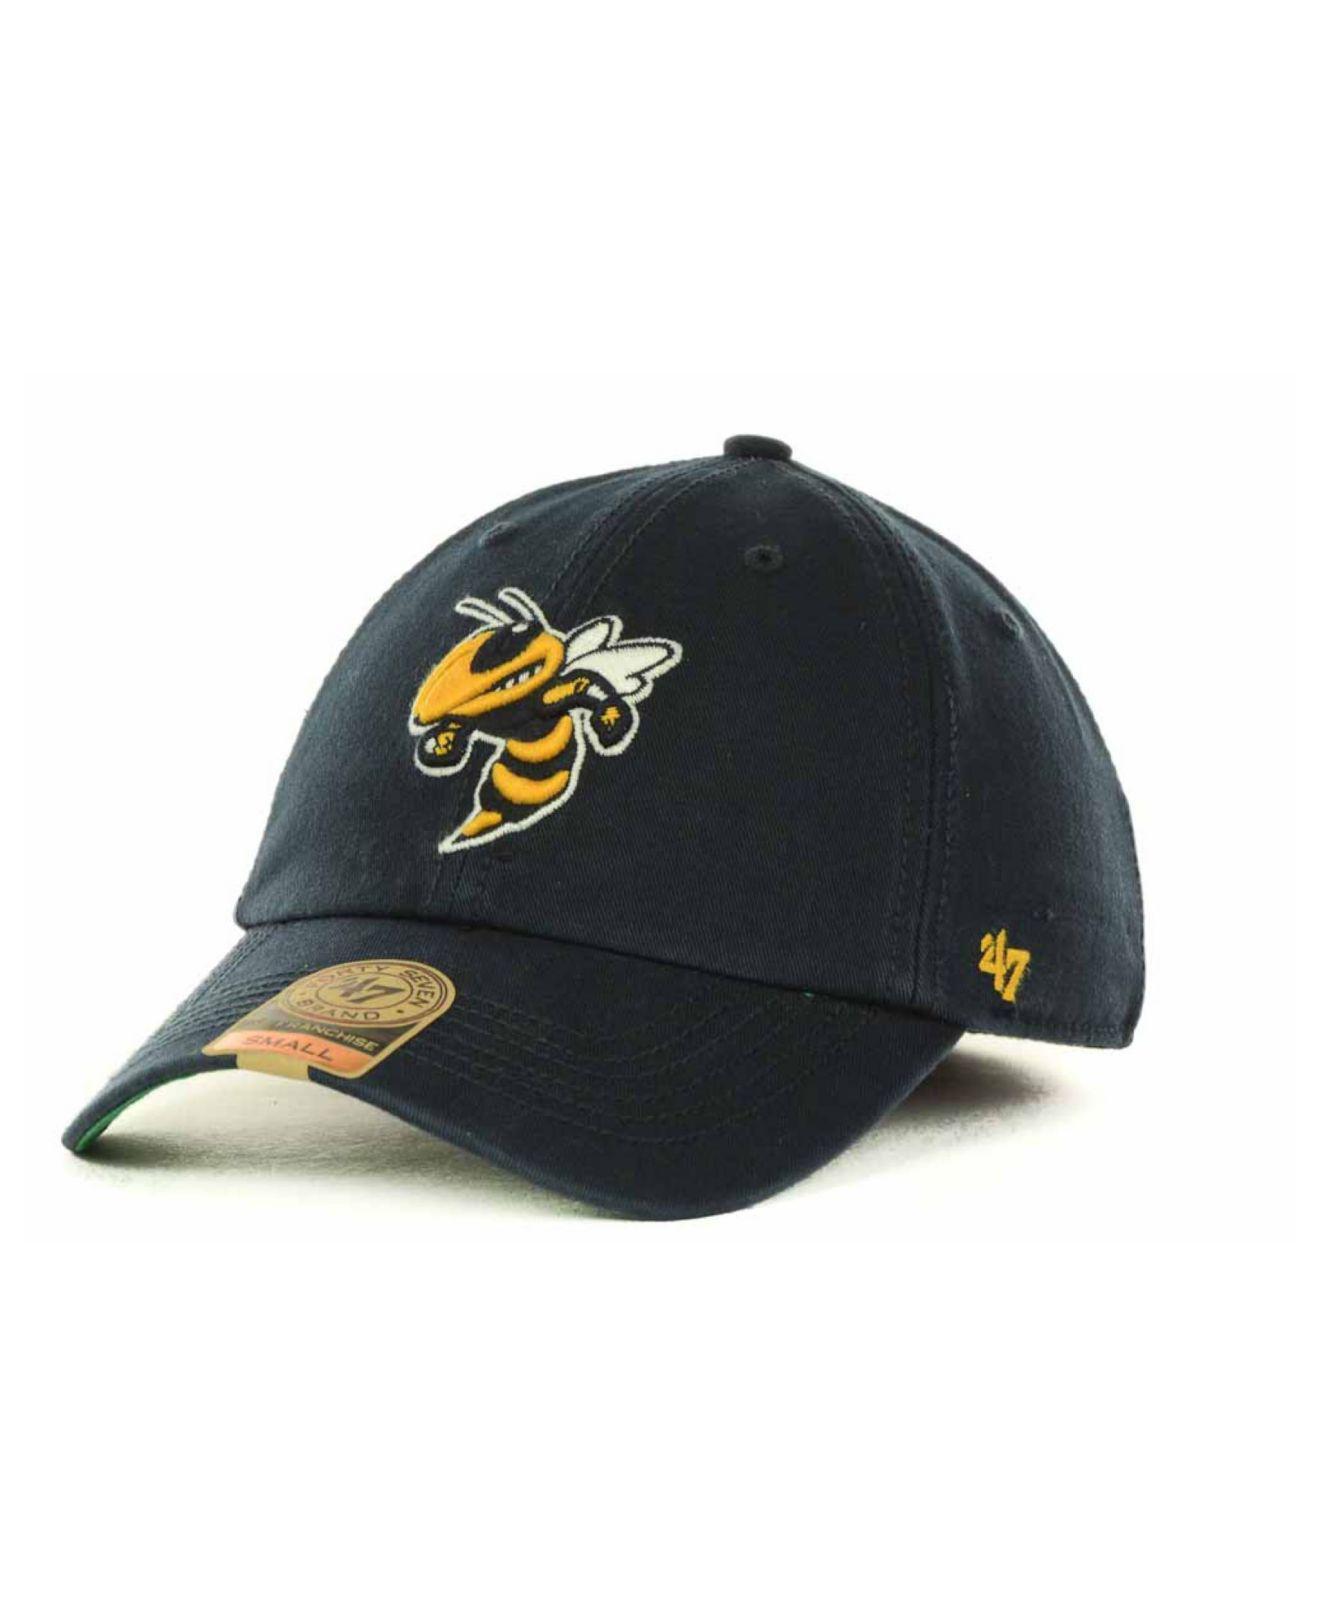 buy online 2583c e7cf4 47 Brand. Men s Blue Georgia Tech Yellow Jackets Franchise Cap